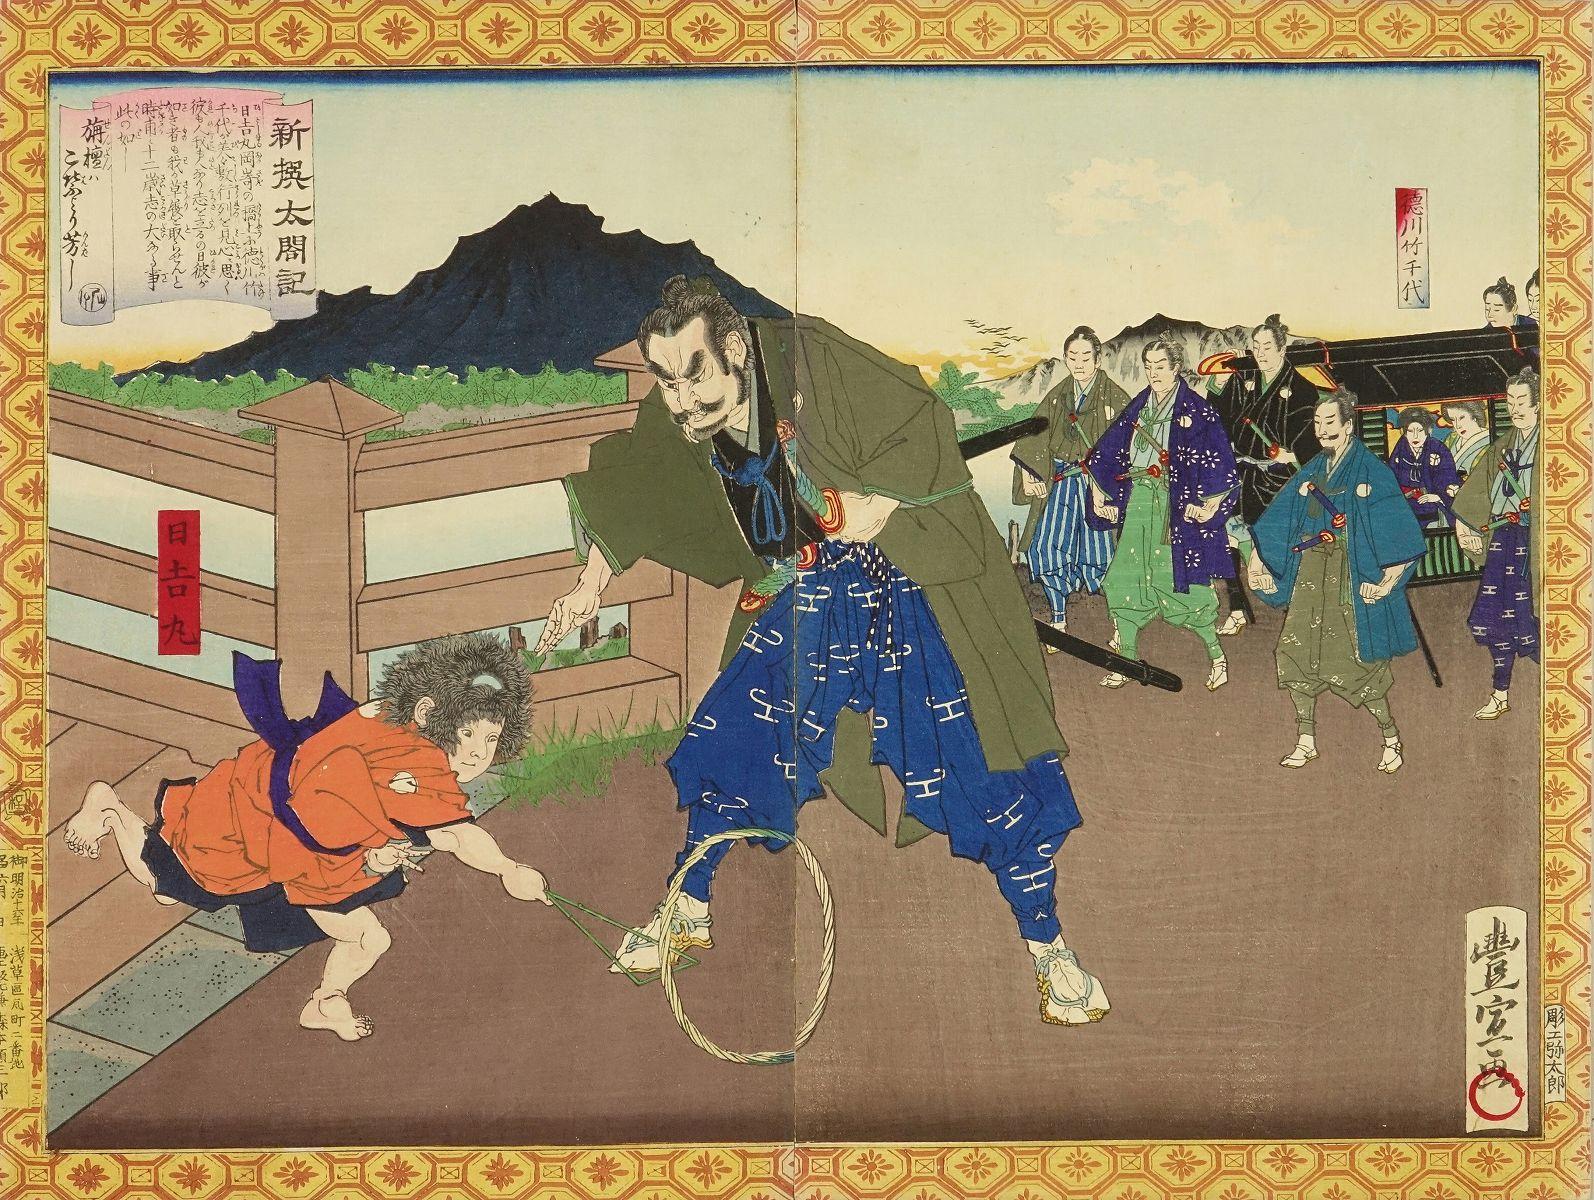 TOYONOBU <i>Shinsen Taikoki</i> (Newly selected history of Toyotomi Hideyoshi), diptych